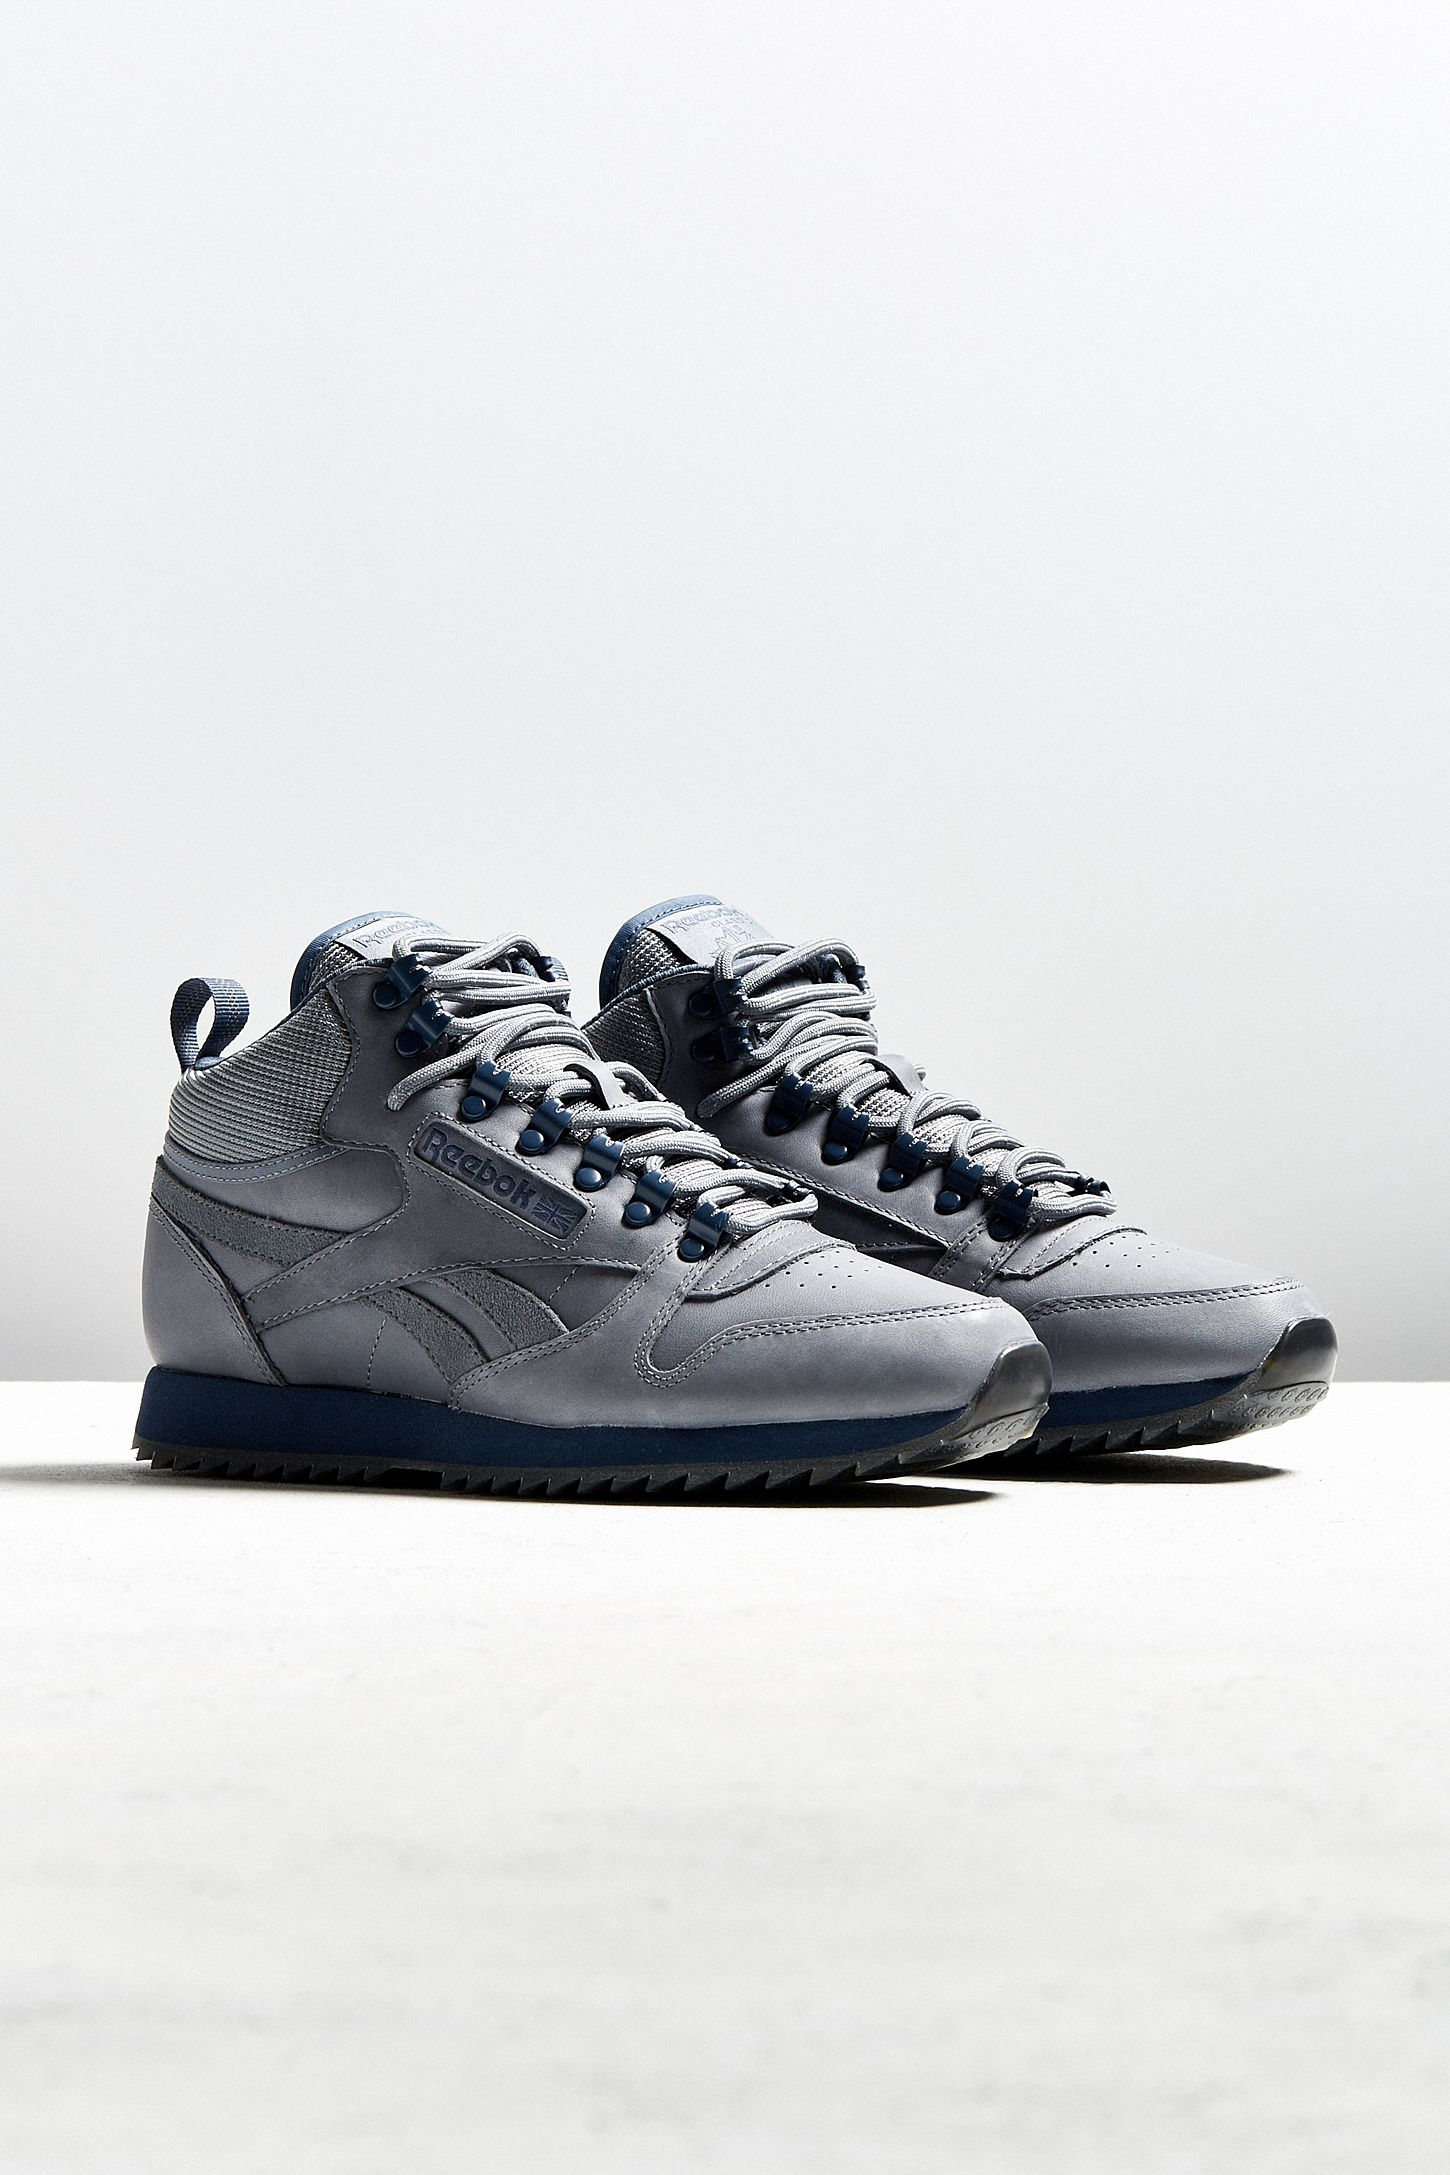 76c25f53582 Reebok Classic Leather Mid Ripple Sneaker